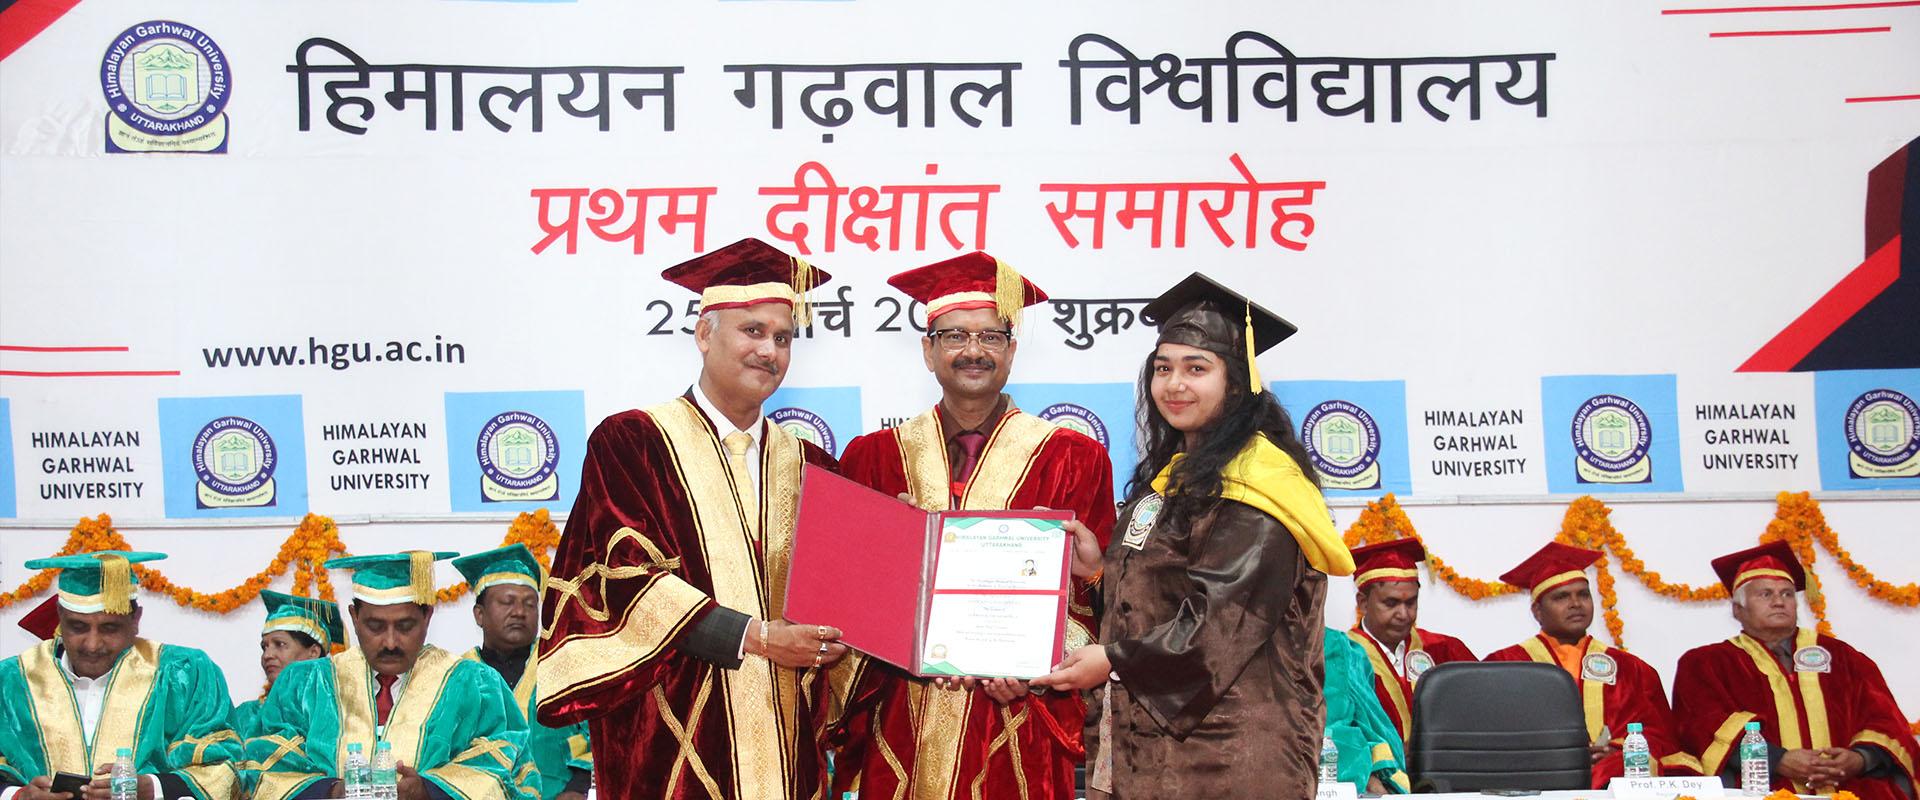 About Us | Himalayan Garhwal University